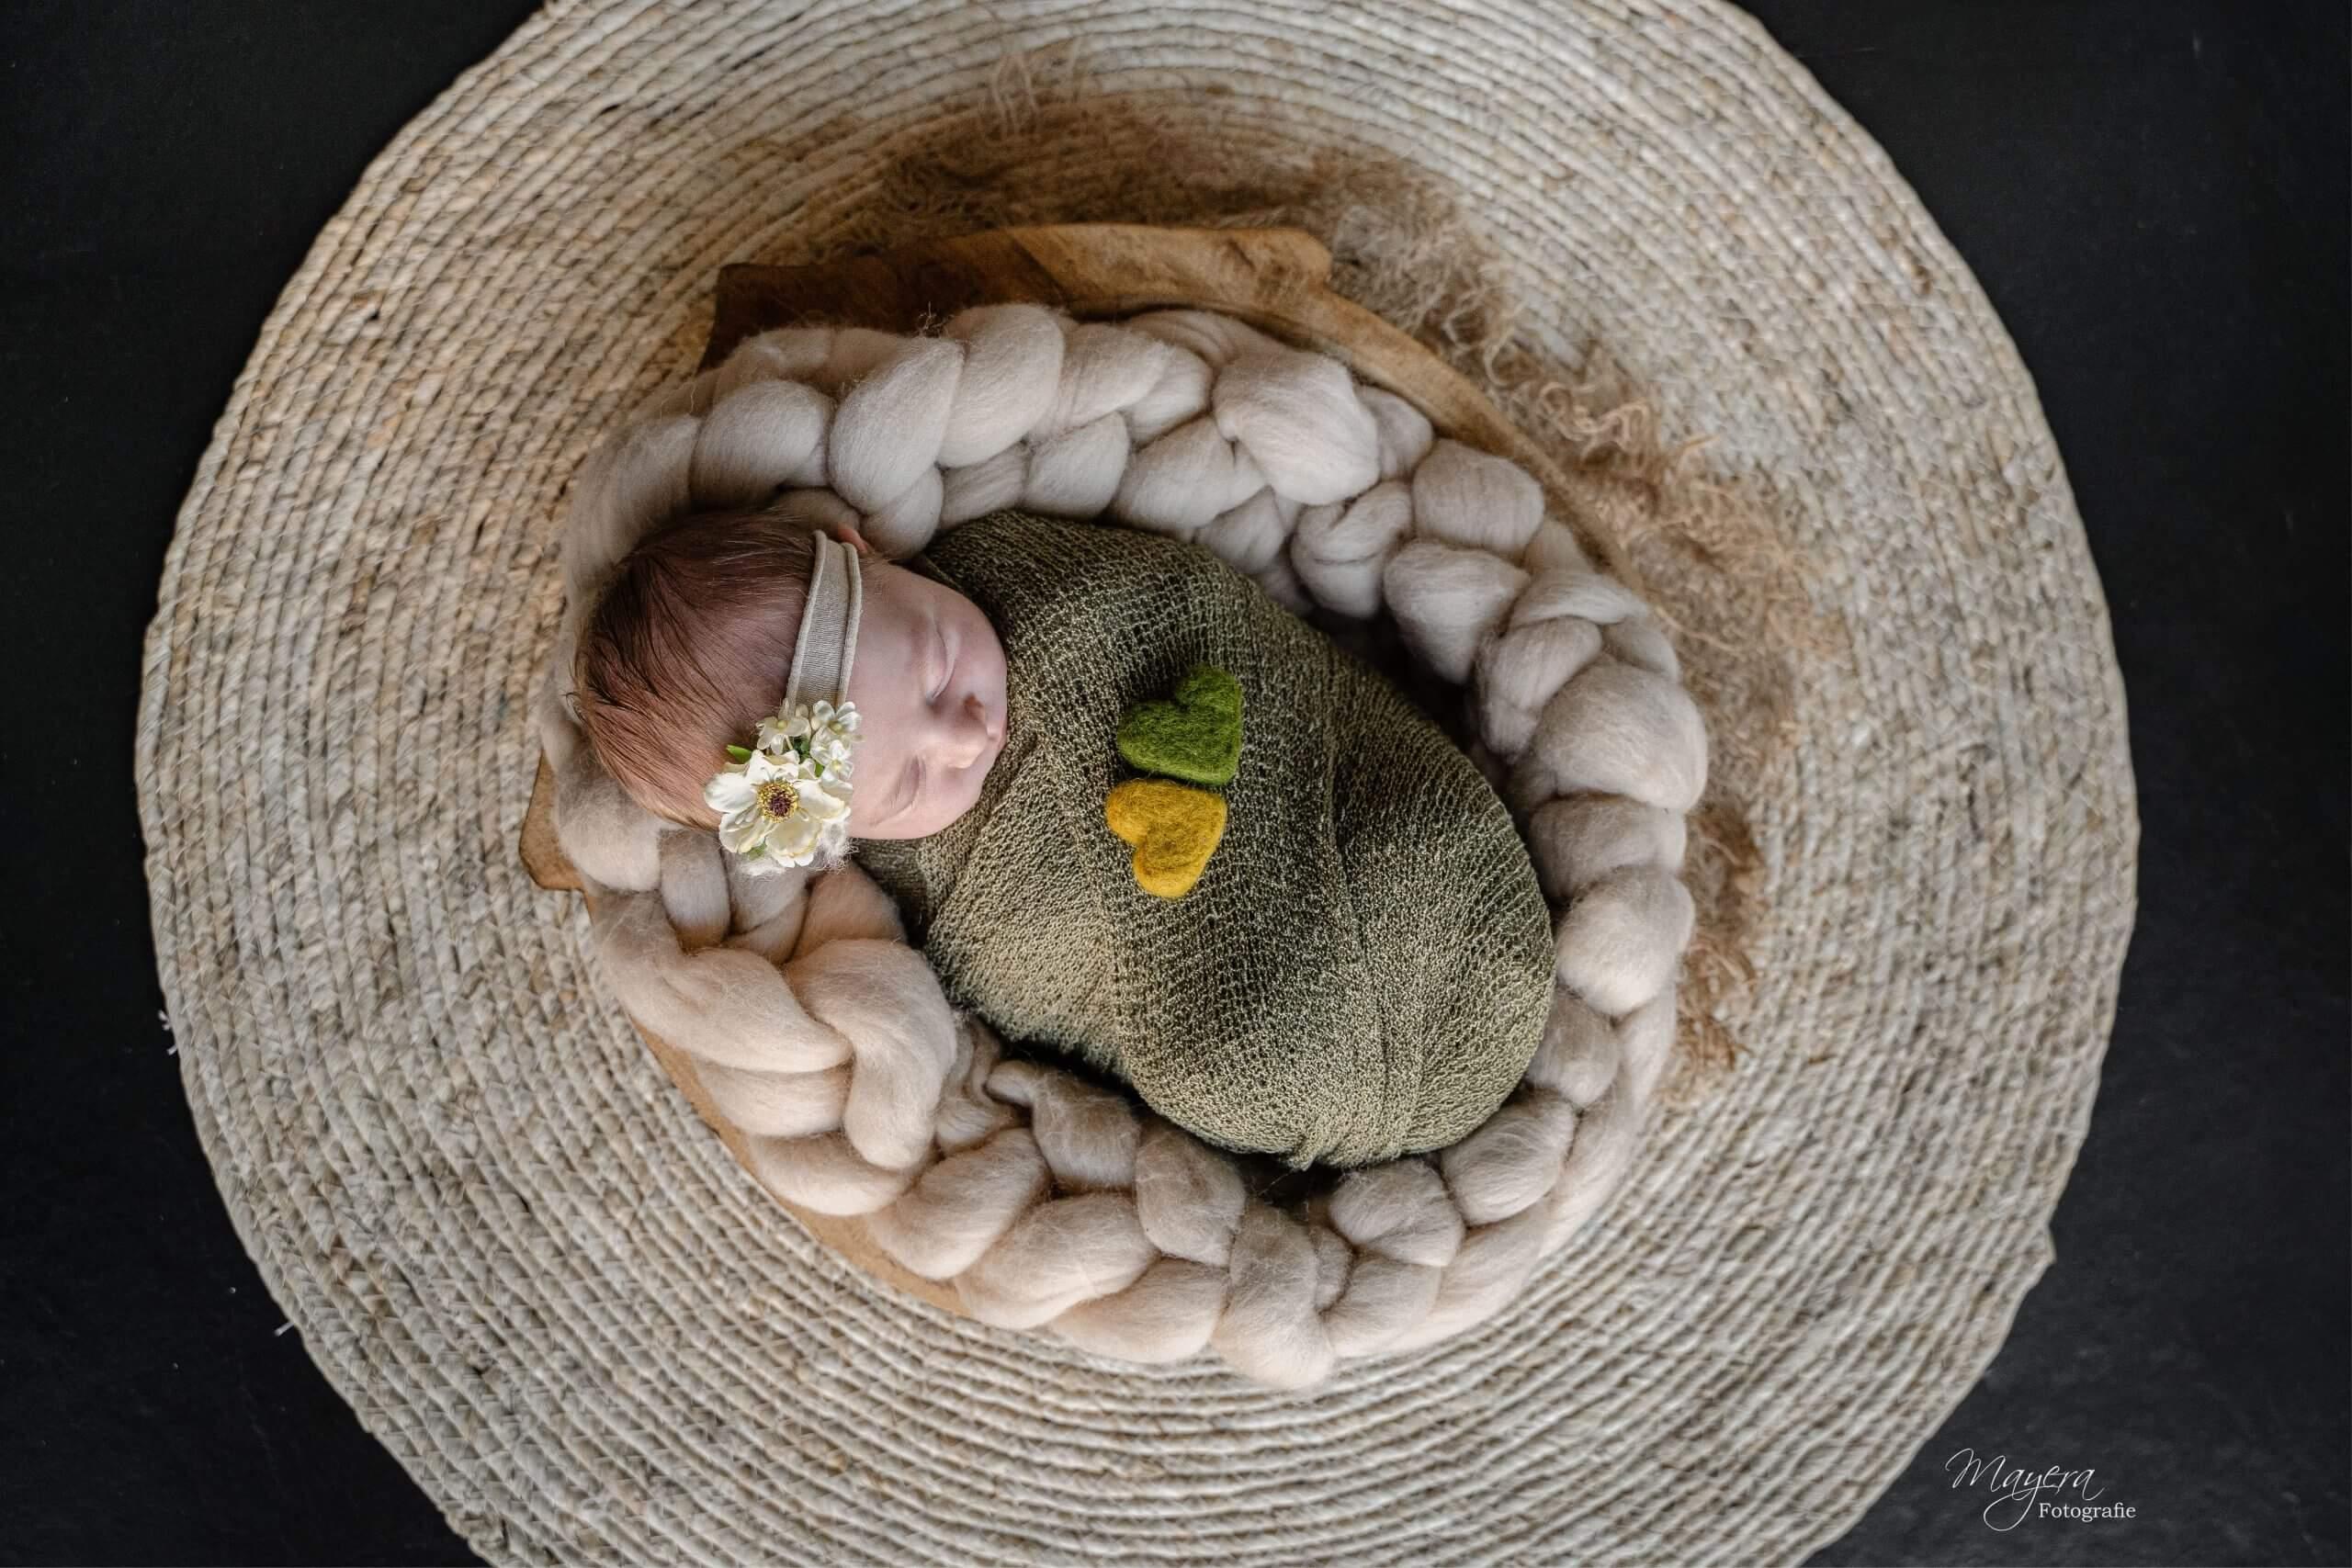 Newborn baby girl fotografe Odijk puur pure